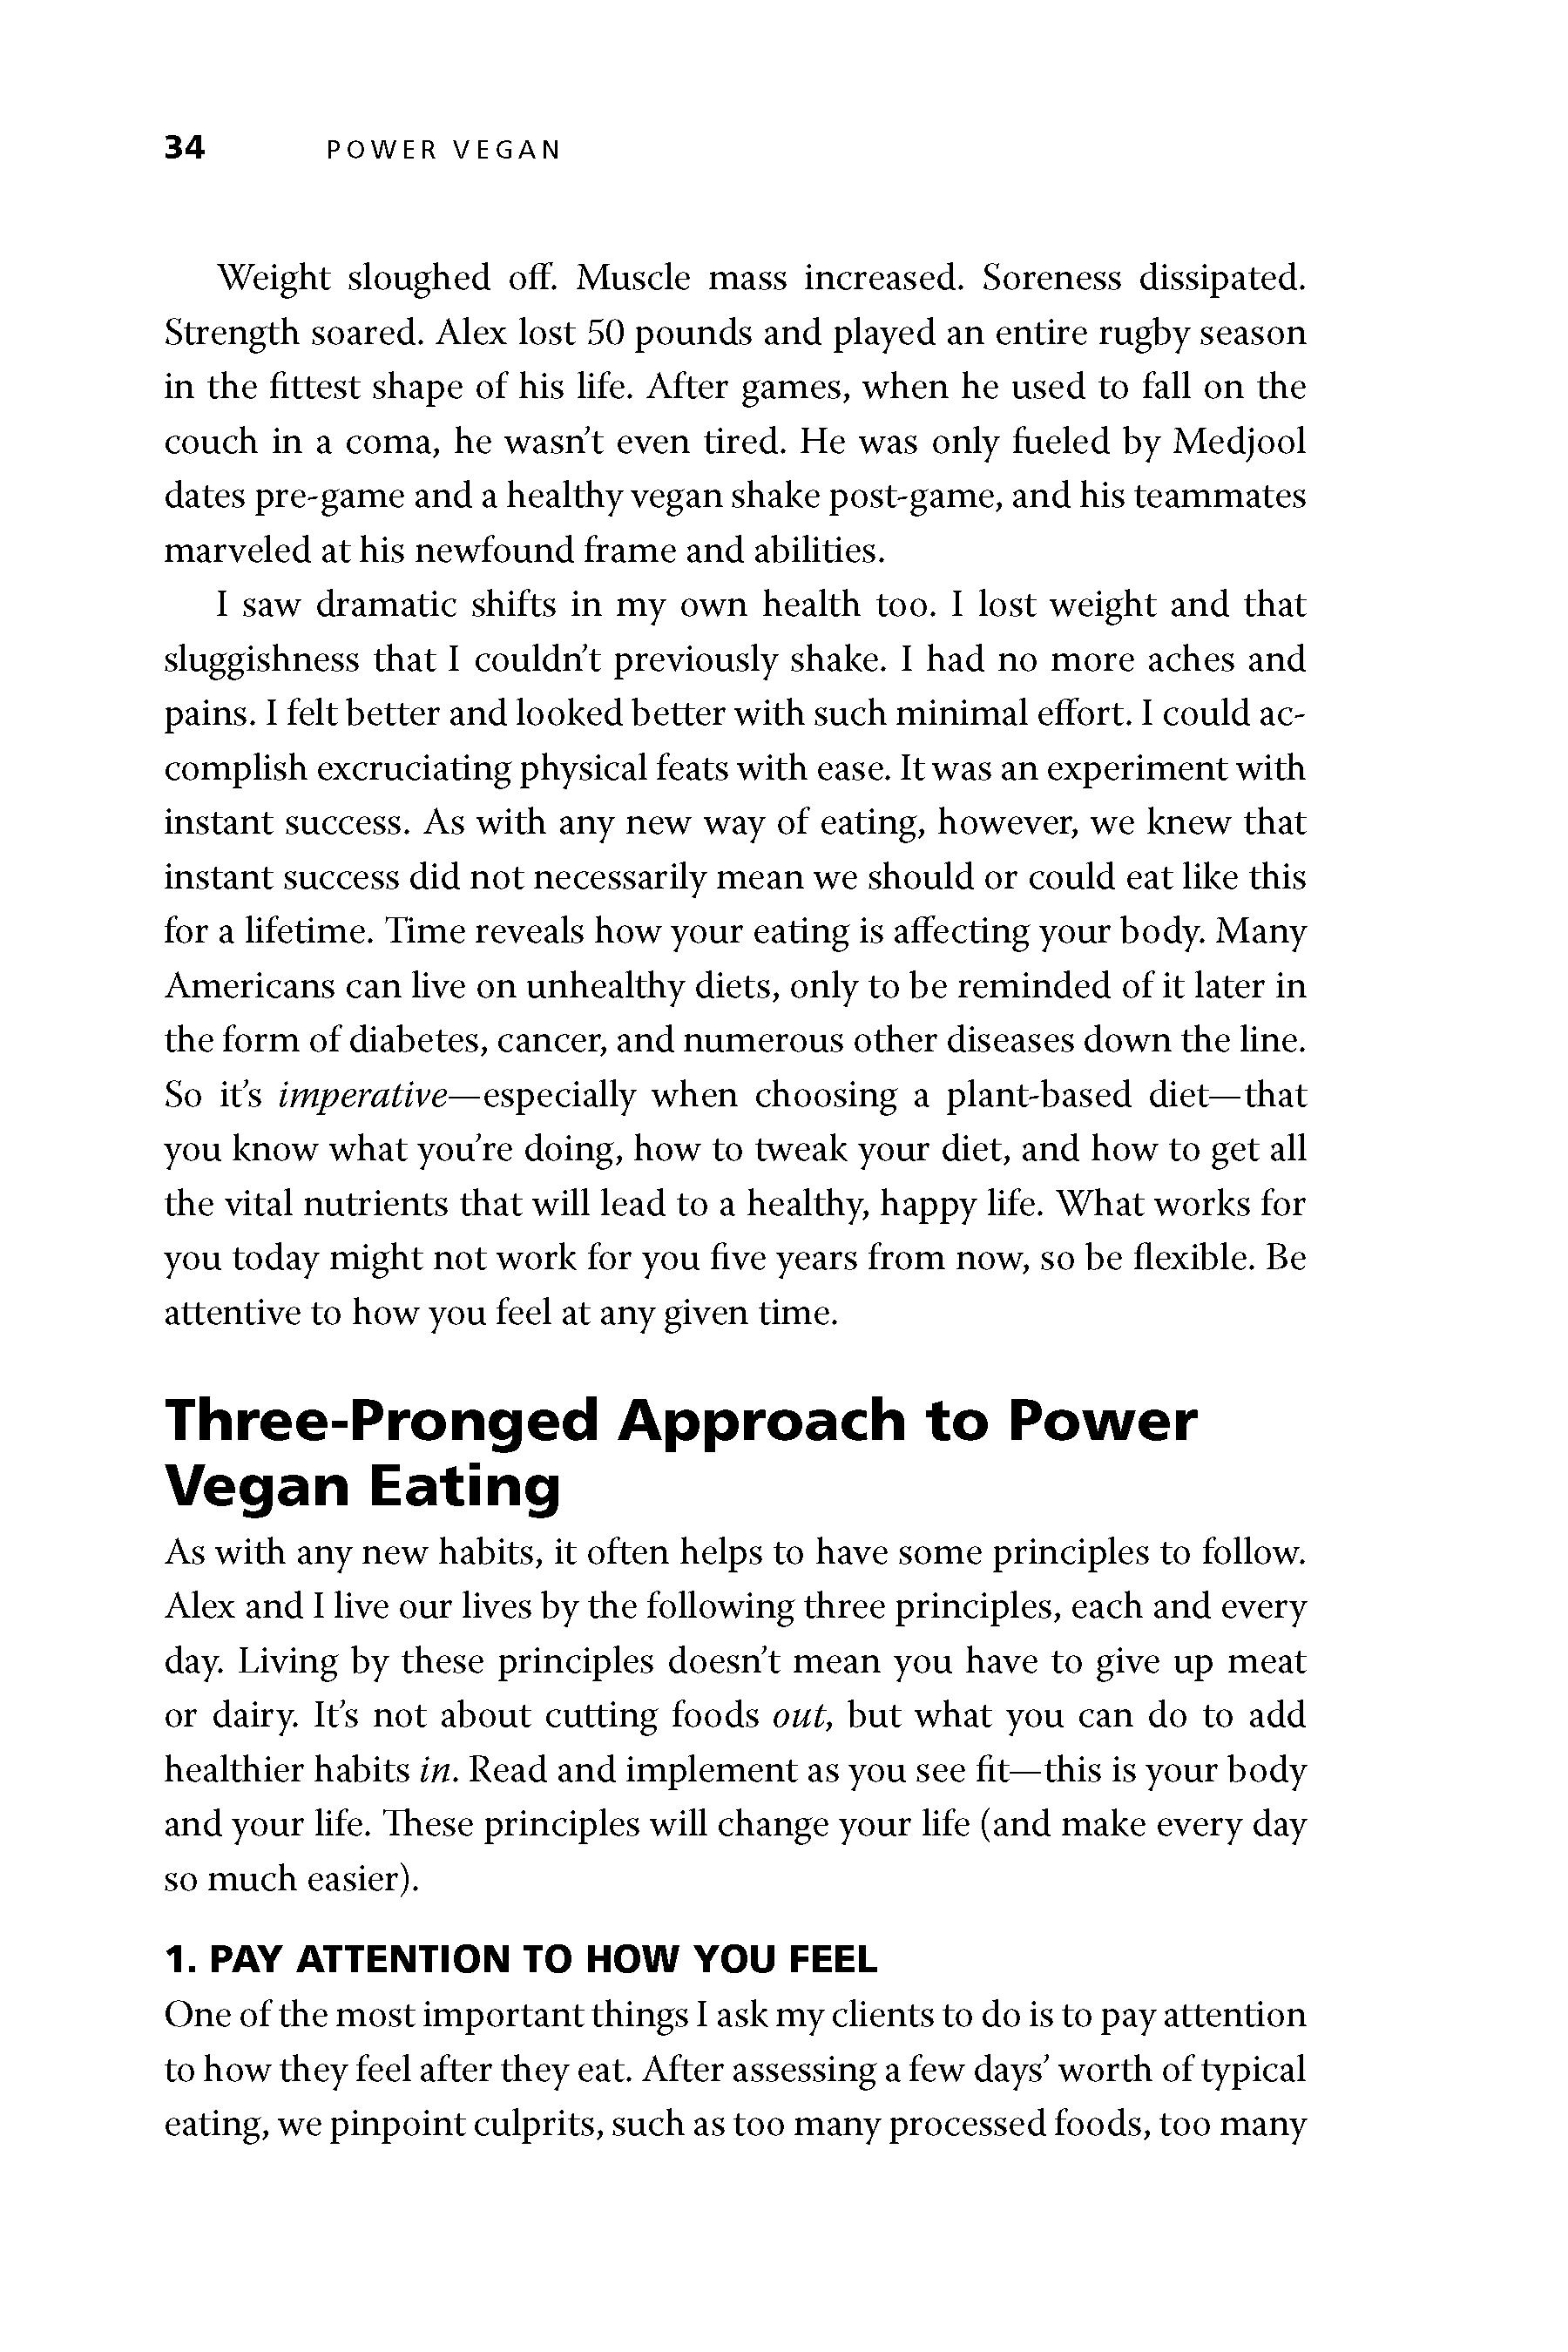 Power Vegan_Page_10.png